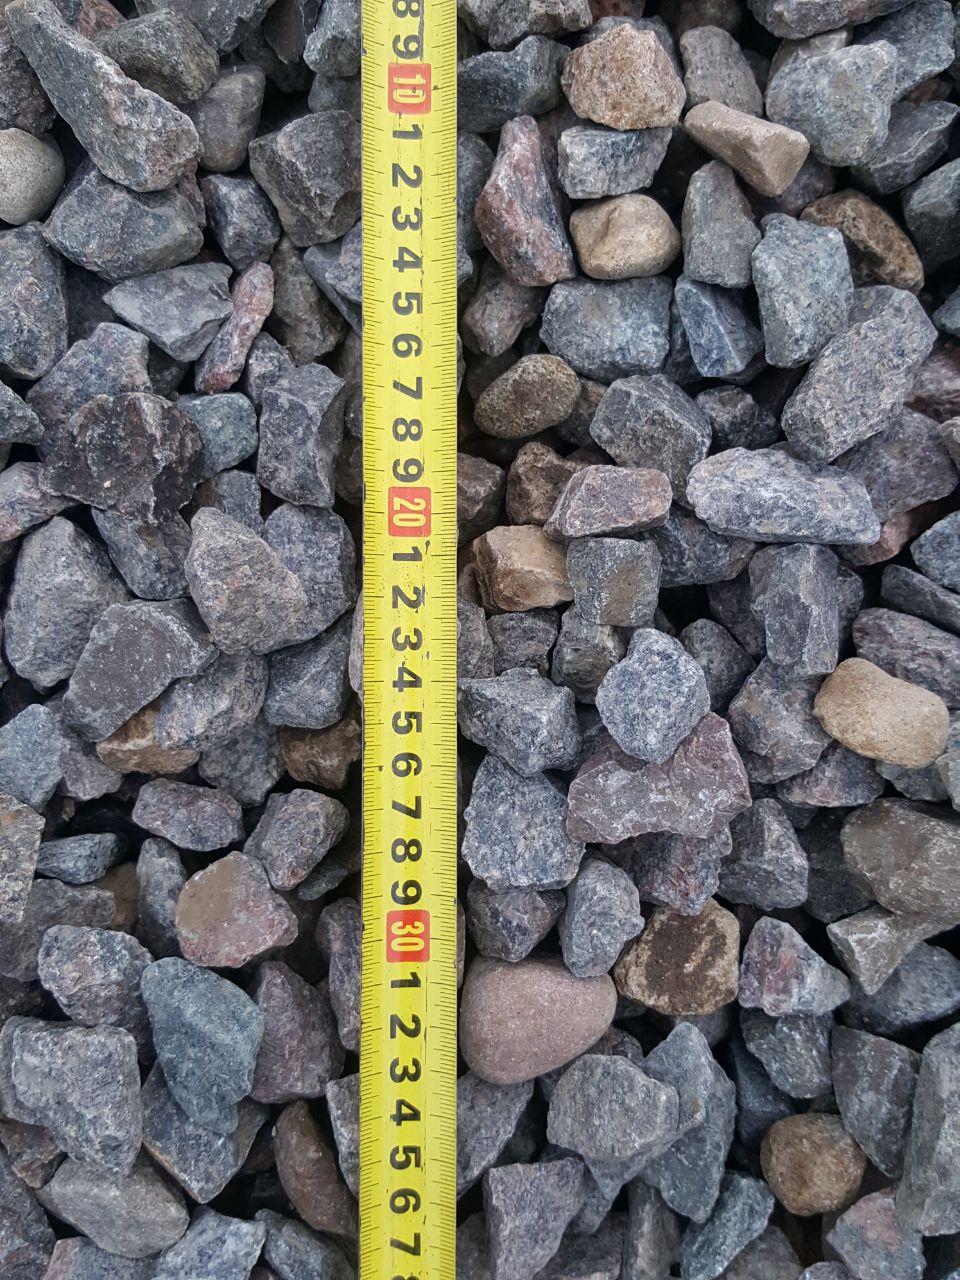 Щебень для бетона цена москва штробления бетона цена